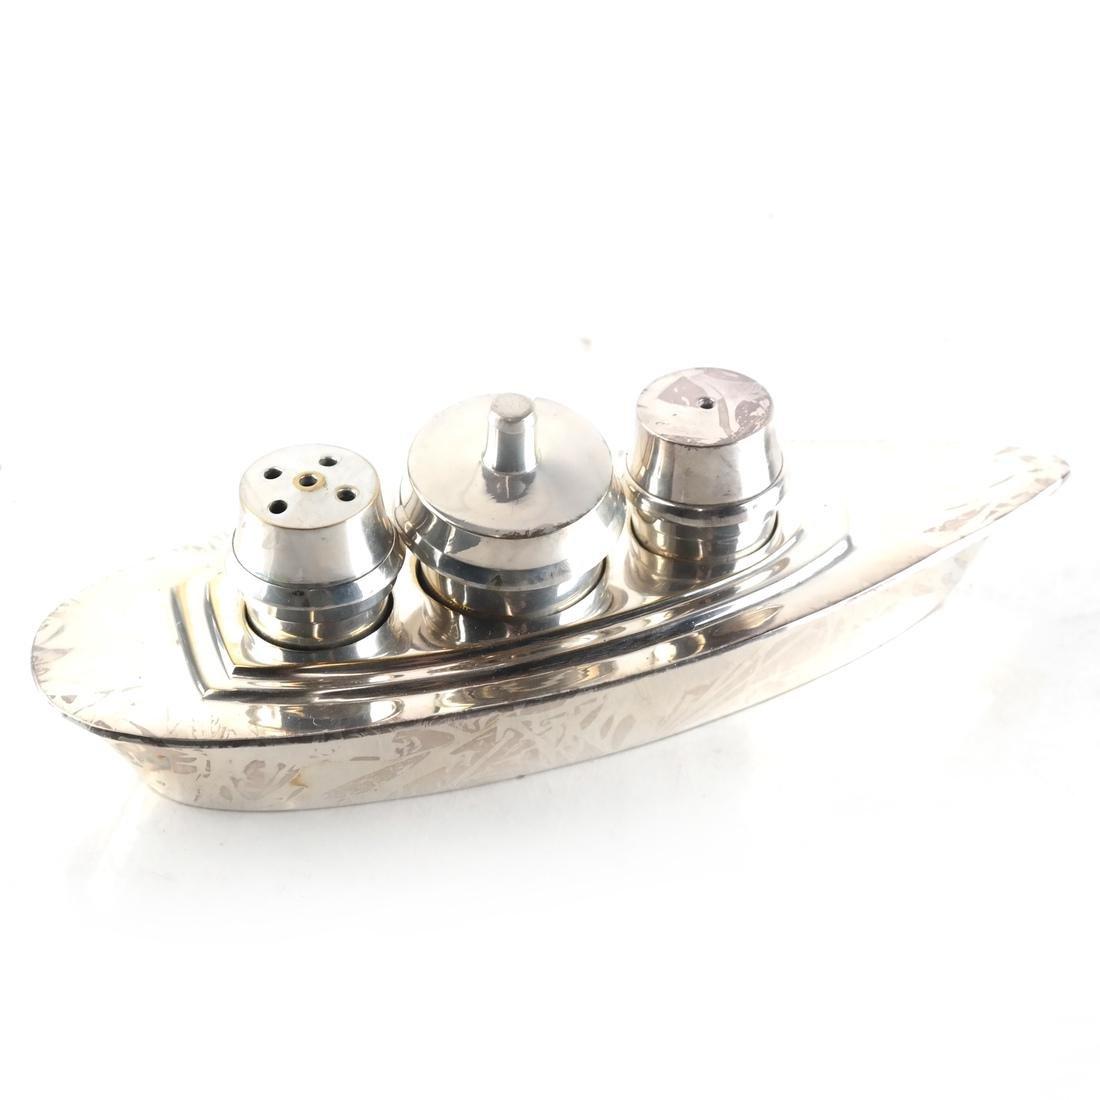 Silver-Plated Boat-Form Cruet